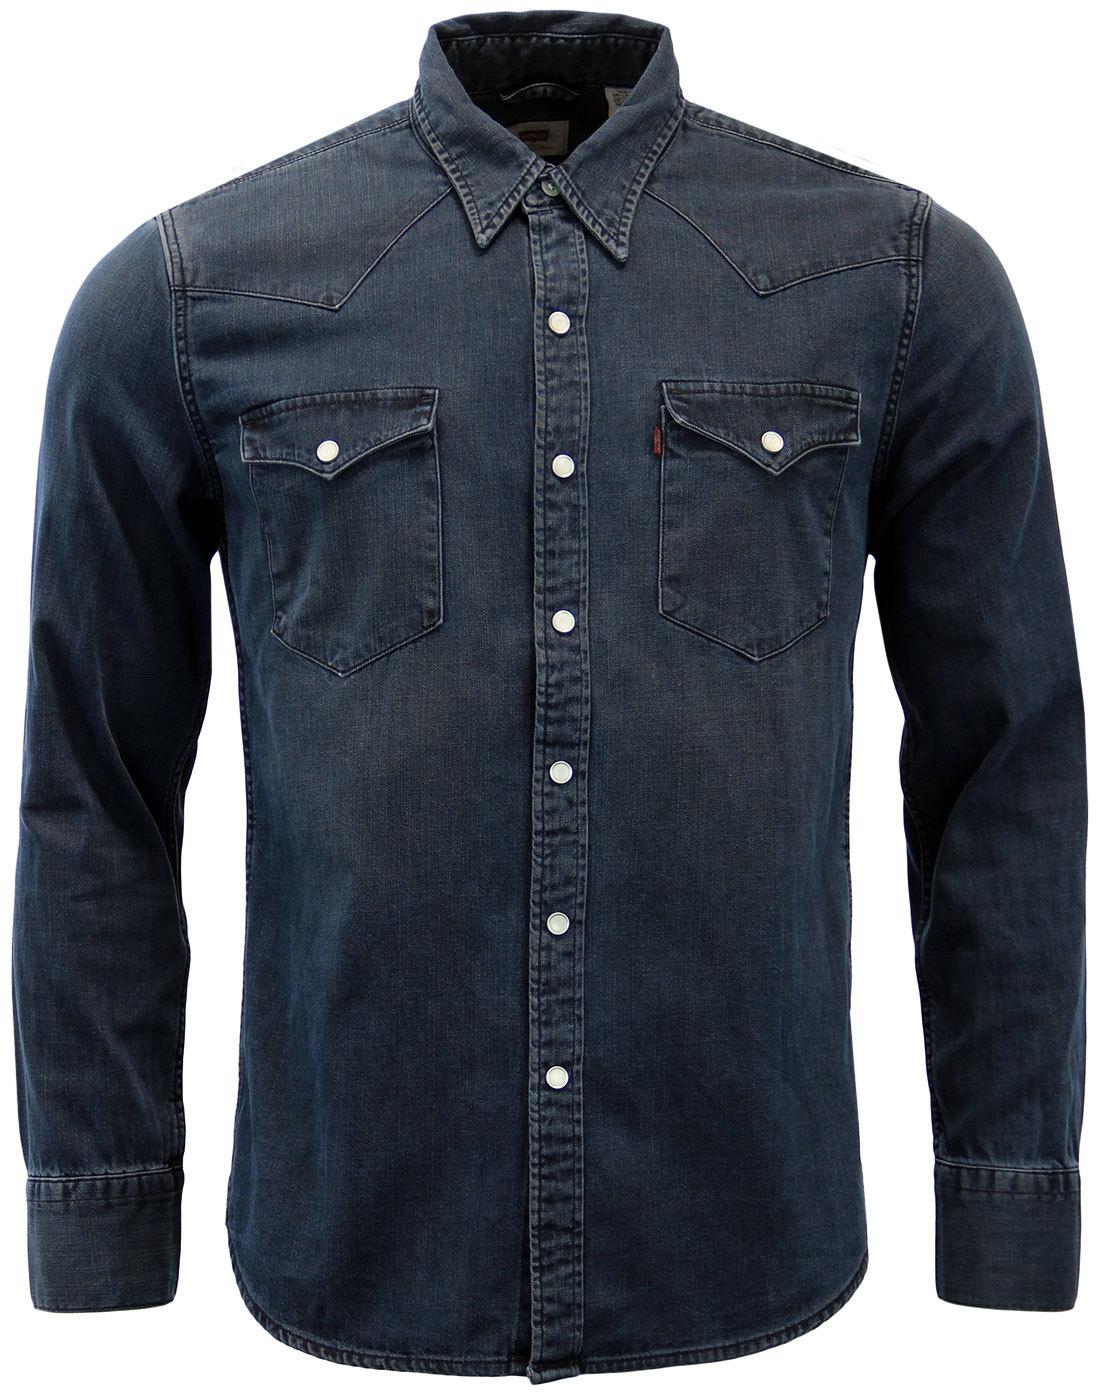 levi 39 s barstow retro 70s mens western denim shirt in. Black Bedroom Furniture Sets. Home Design Ideas